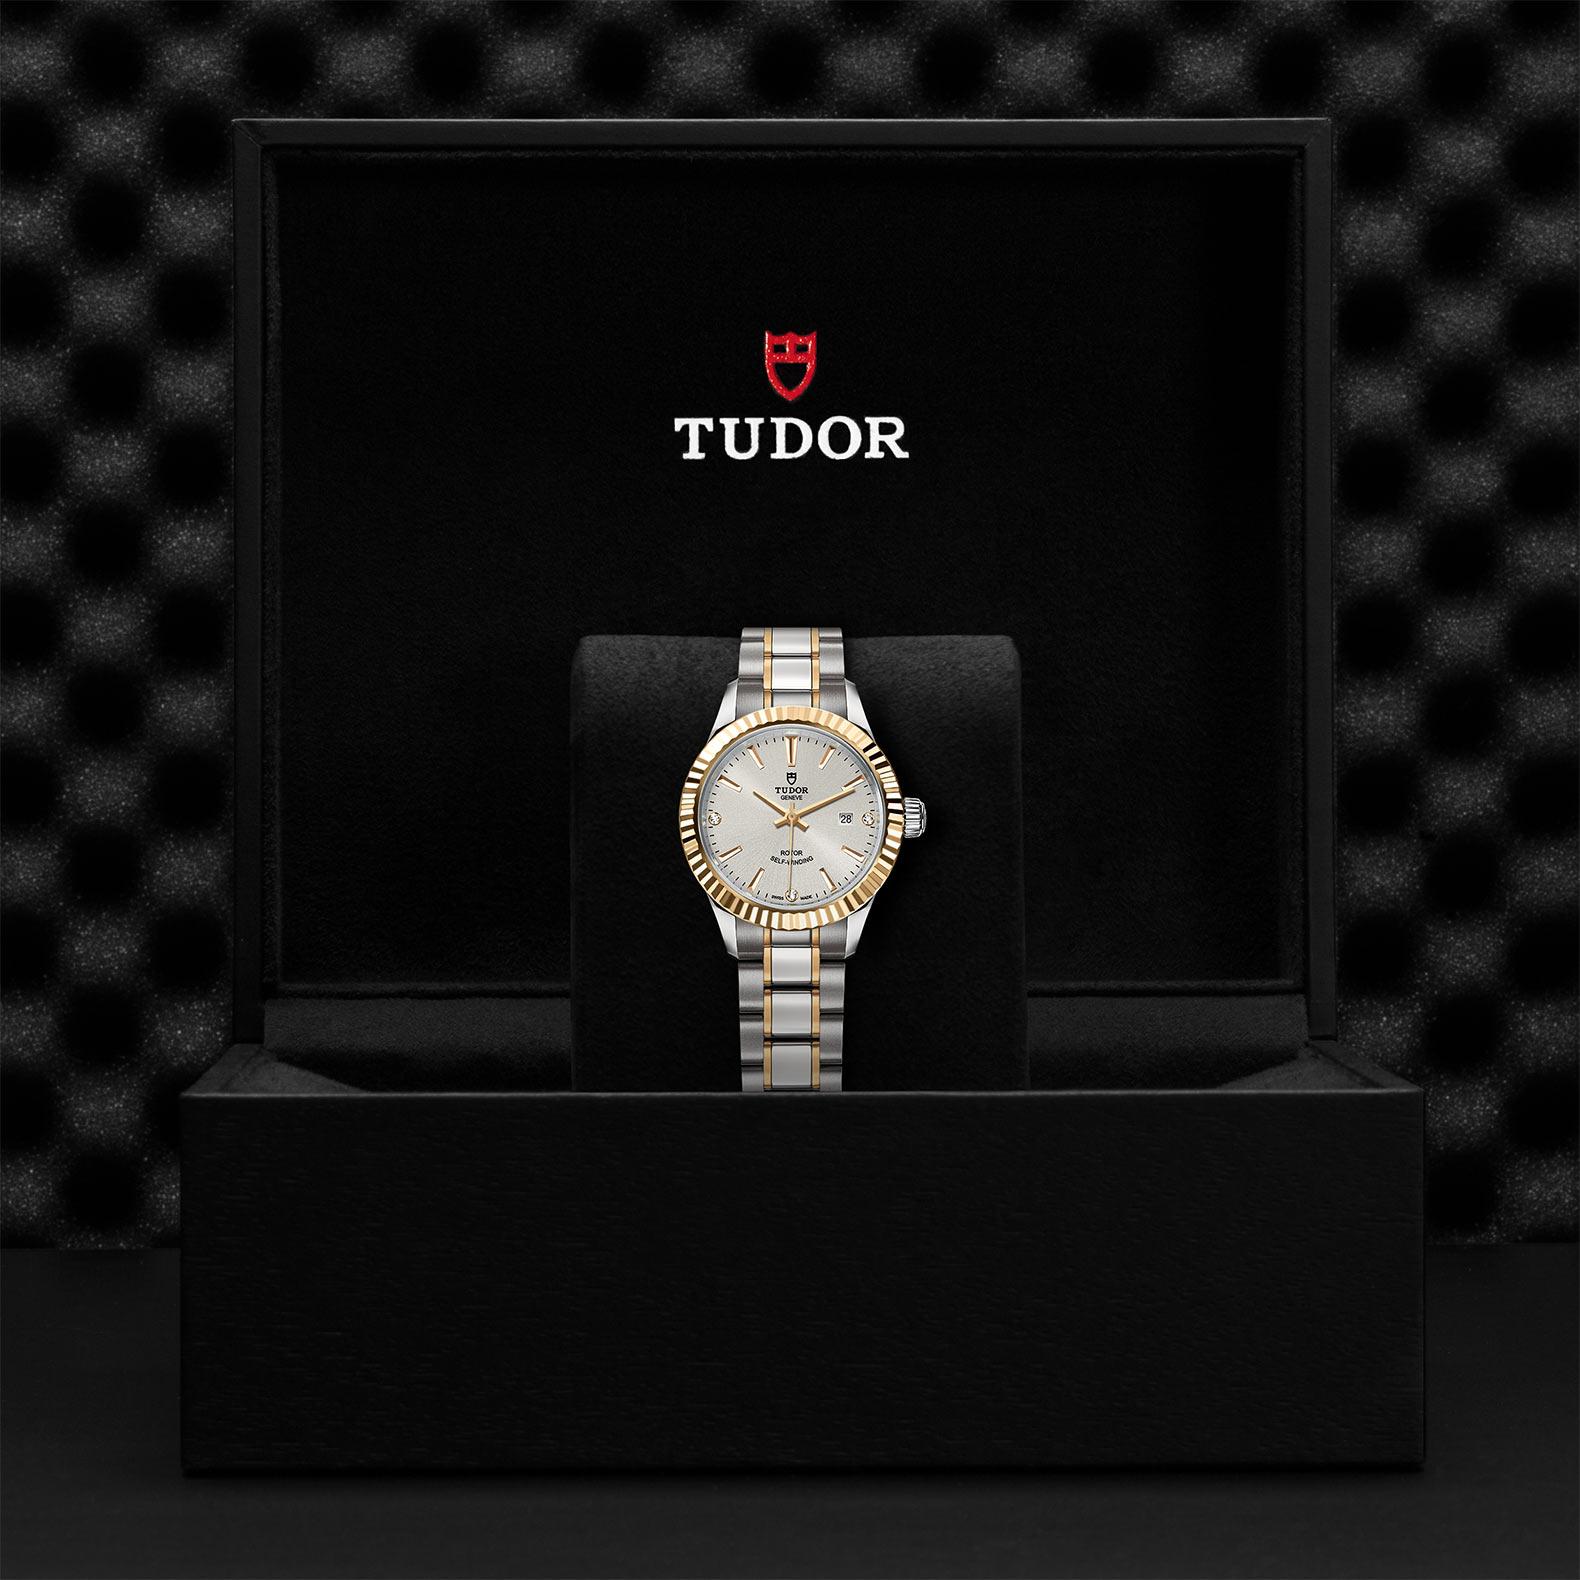 TUDOR Style M12113 0009 Presentation